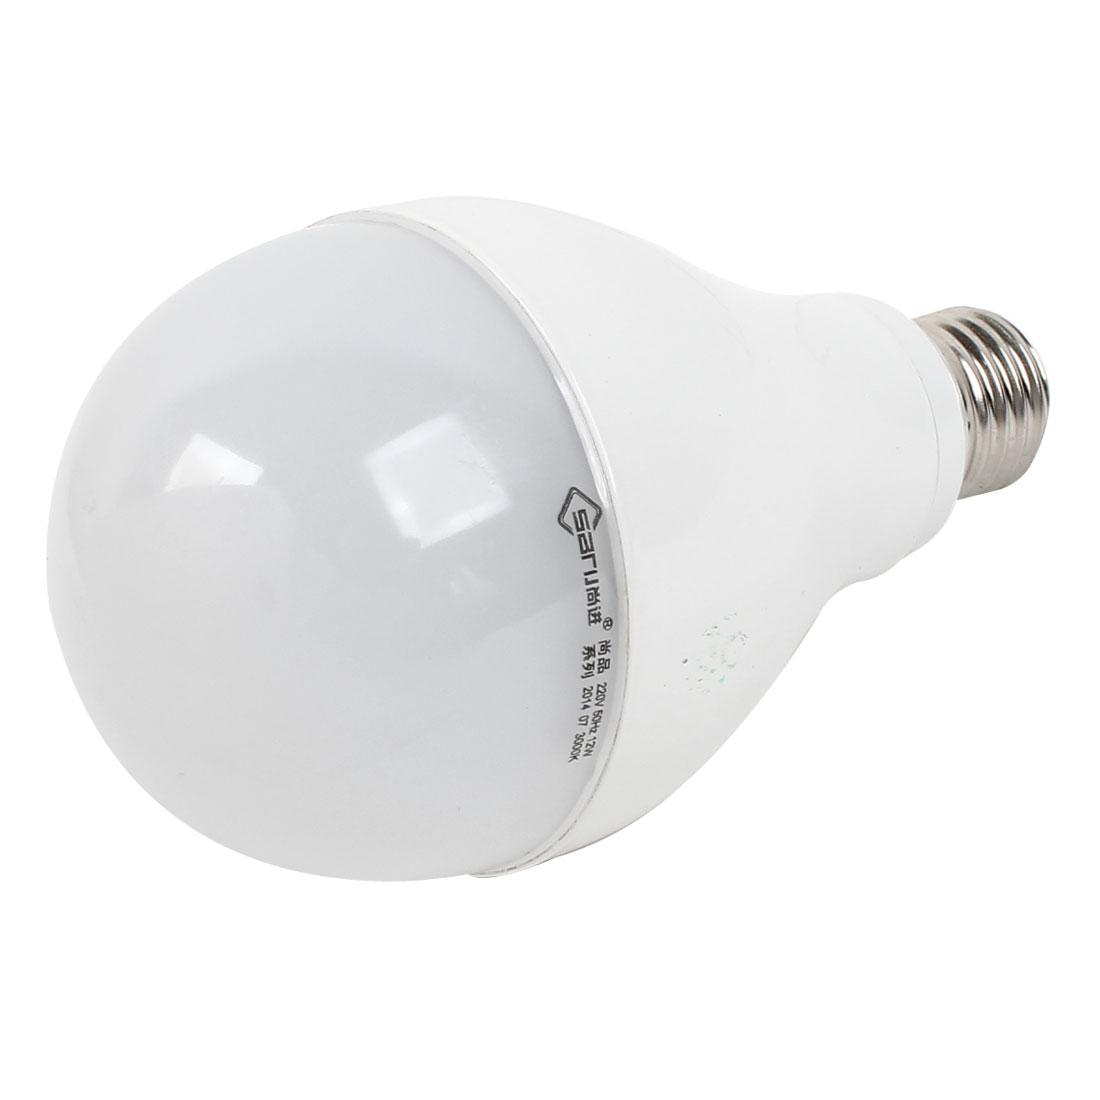 Home E27 Energy Saving LED Globe Ball White Light Lamp Bulb AC 200V-240V 12W